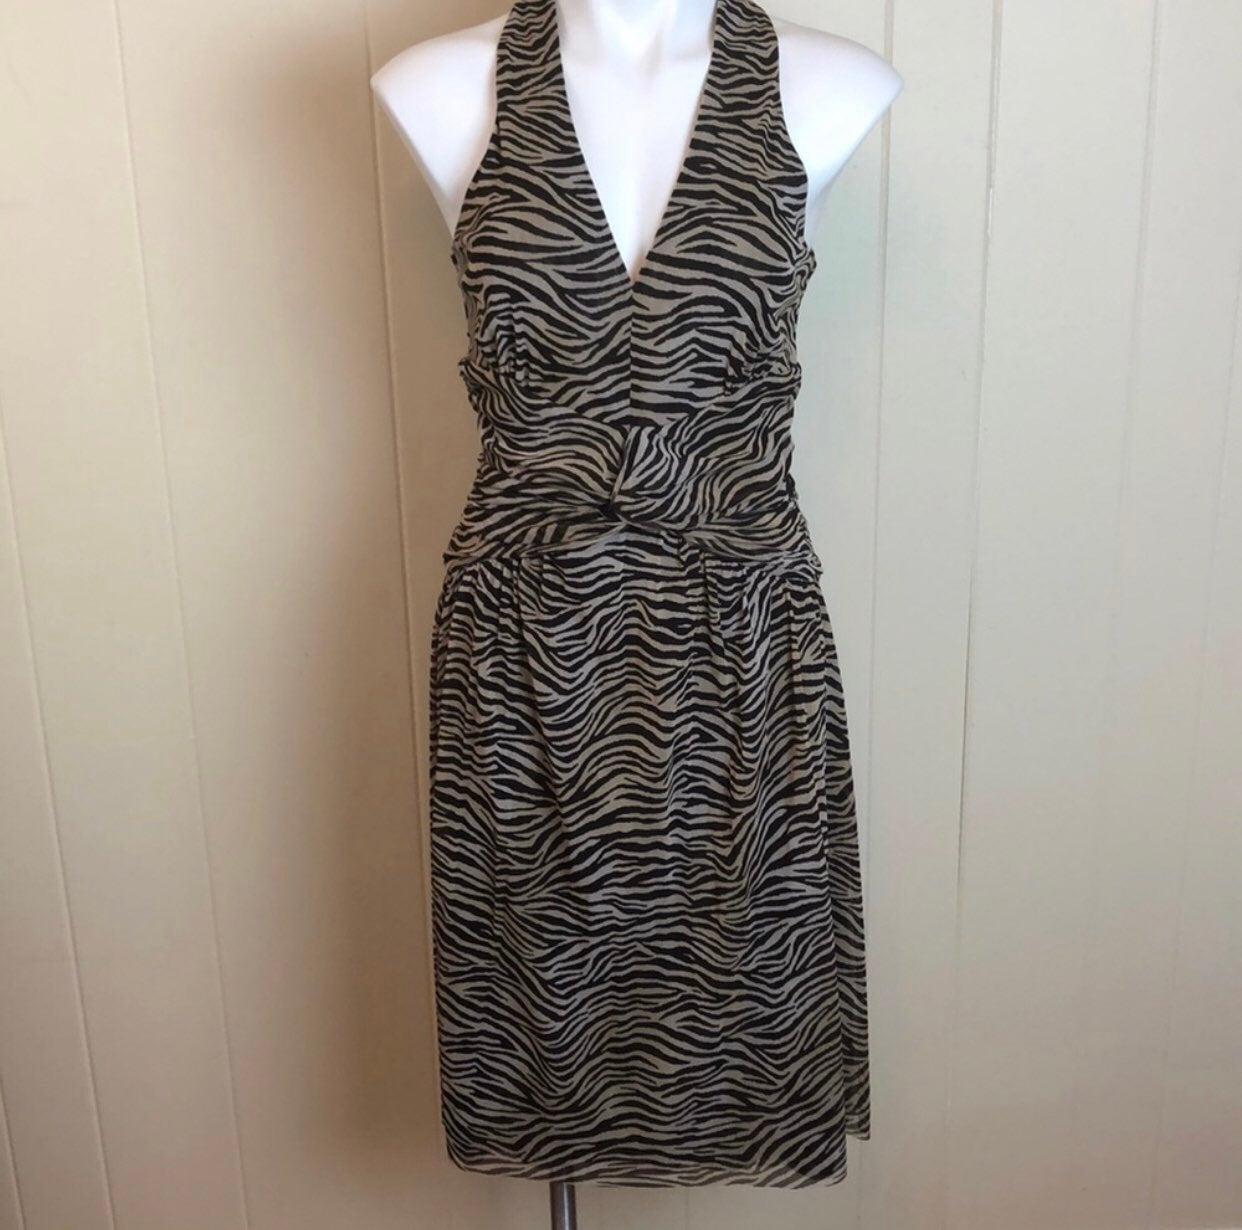 Michaels Kors Zebra Party Dress Sz S